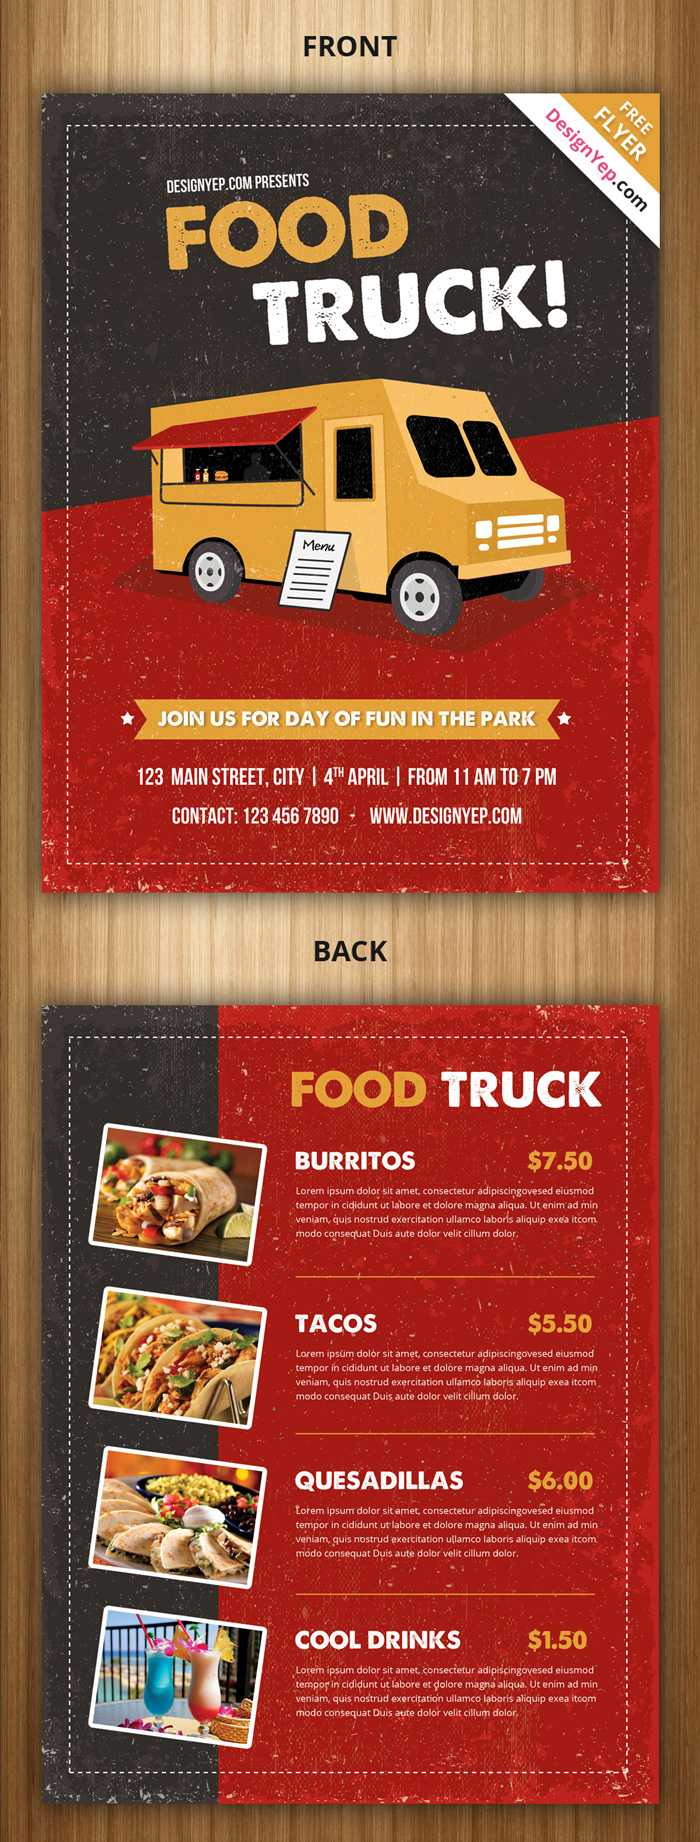 21 Free Food Menu Templates For Restaurants – Designyep Throughout Food Truck Menu Template